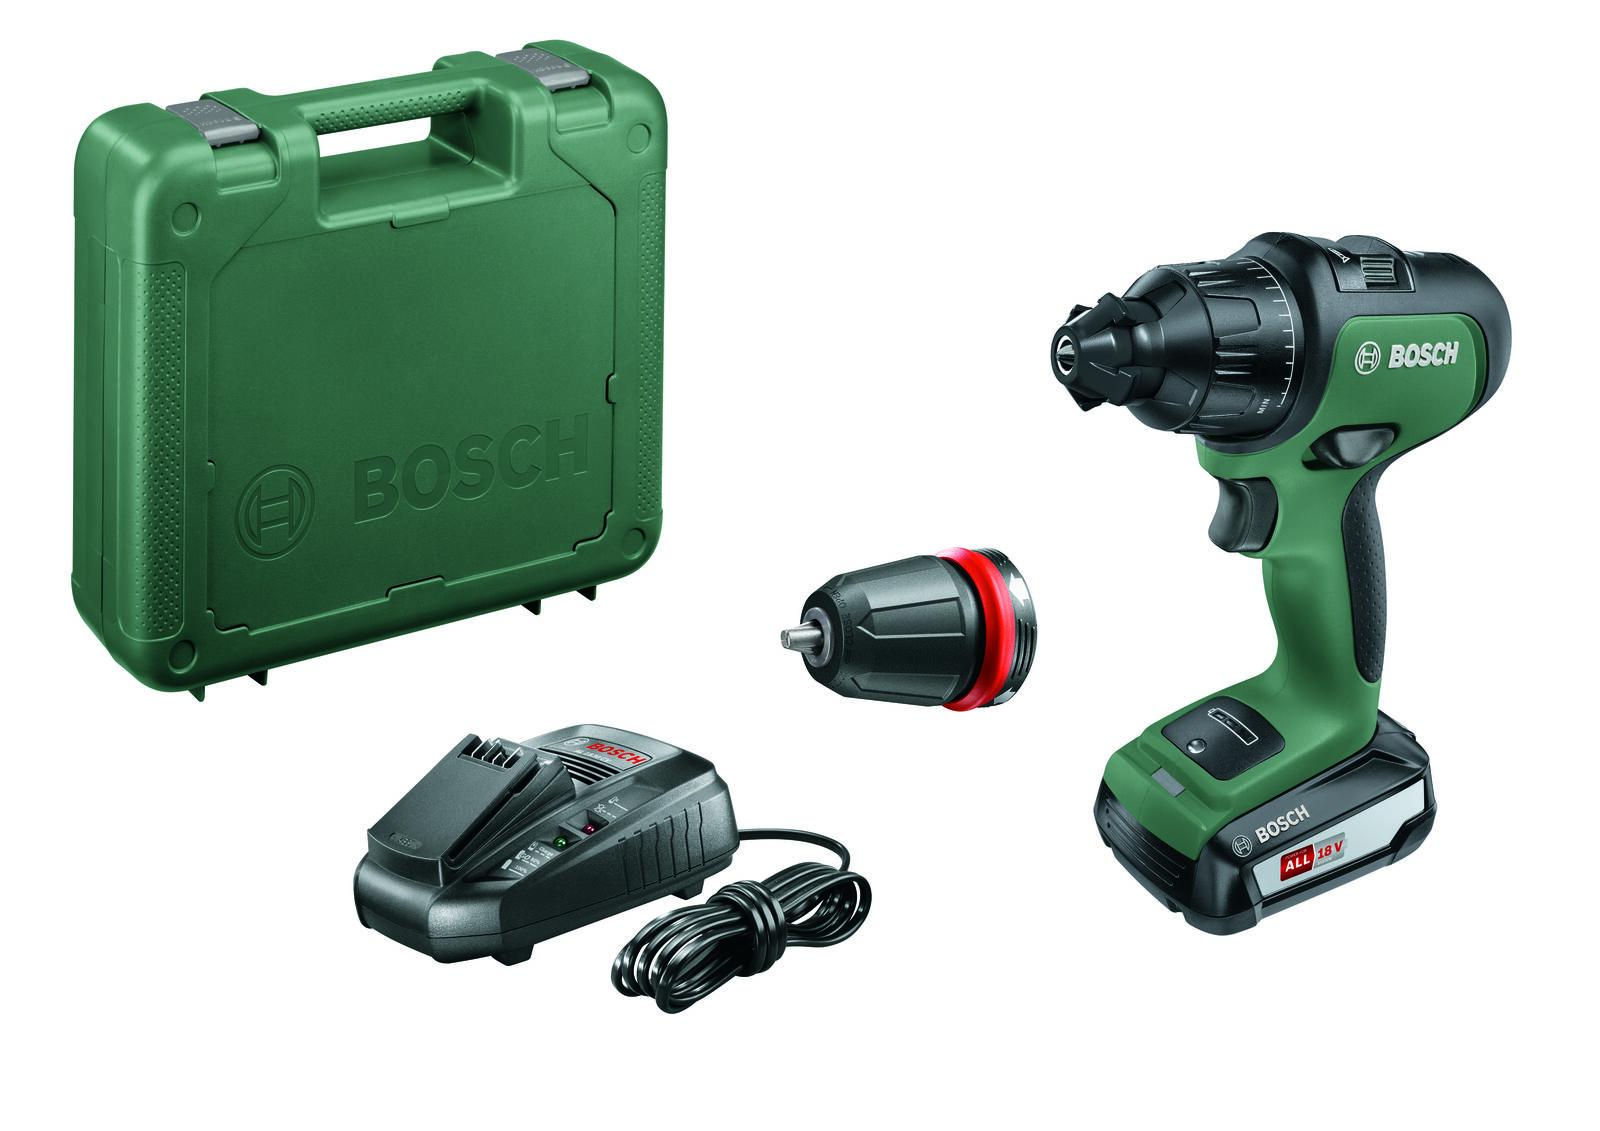 Bosch Akku-Bohrschrauber AdvancedImpact 18 - 18 V, 2,5 Ah, 1 Akku, 22 32 Nm